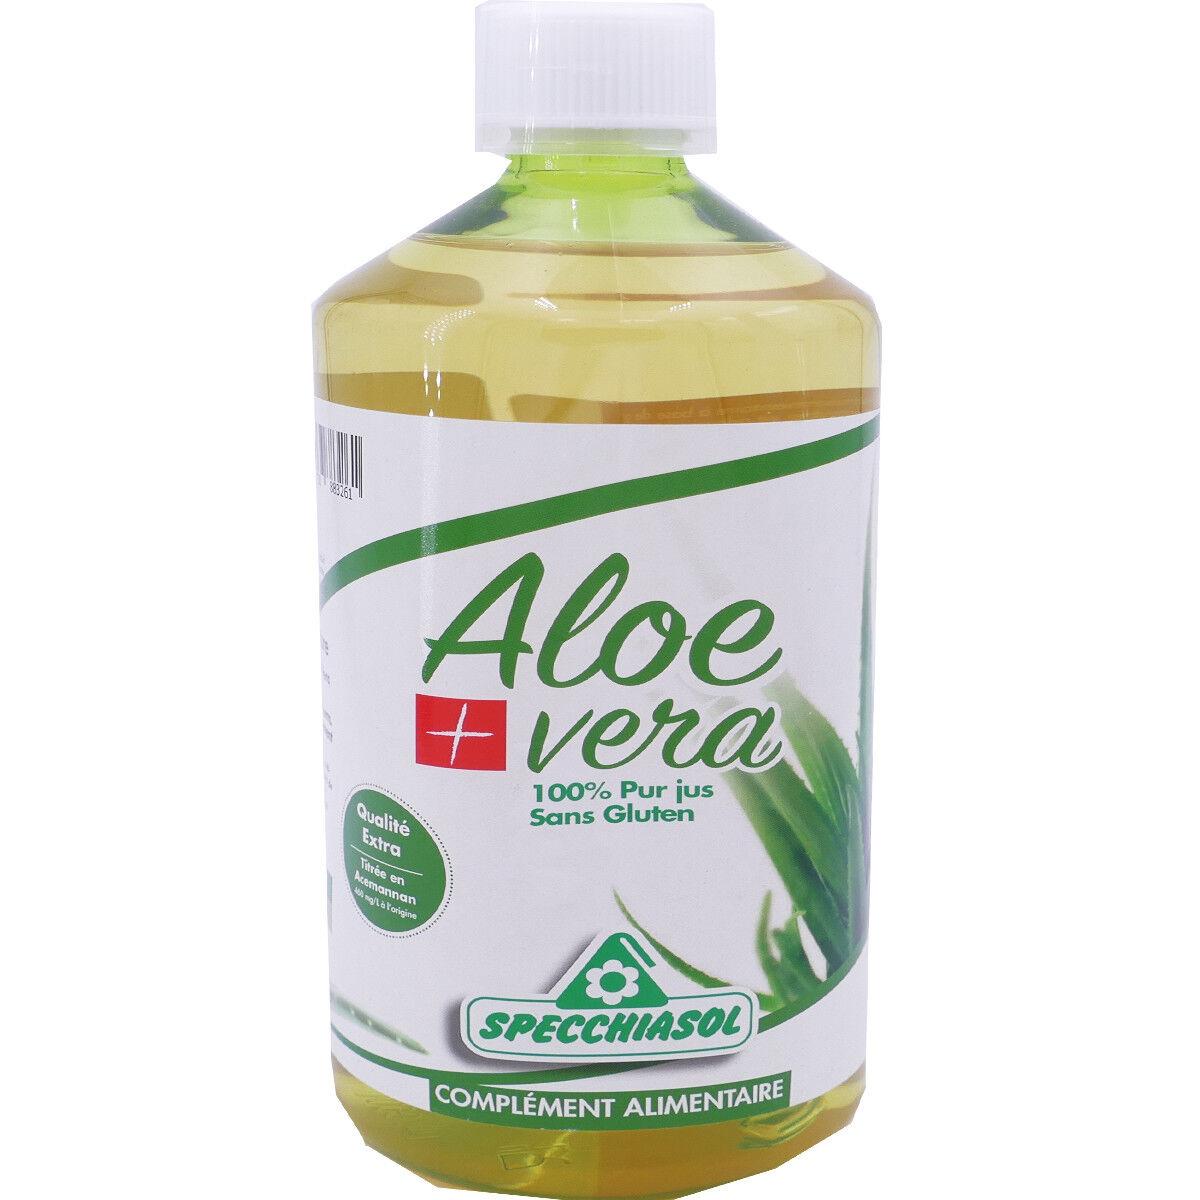 BARBEWIN Aloevera pur jus sans gluten 1 l